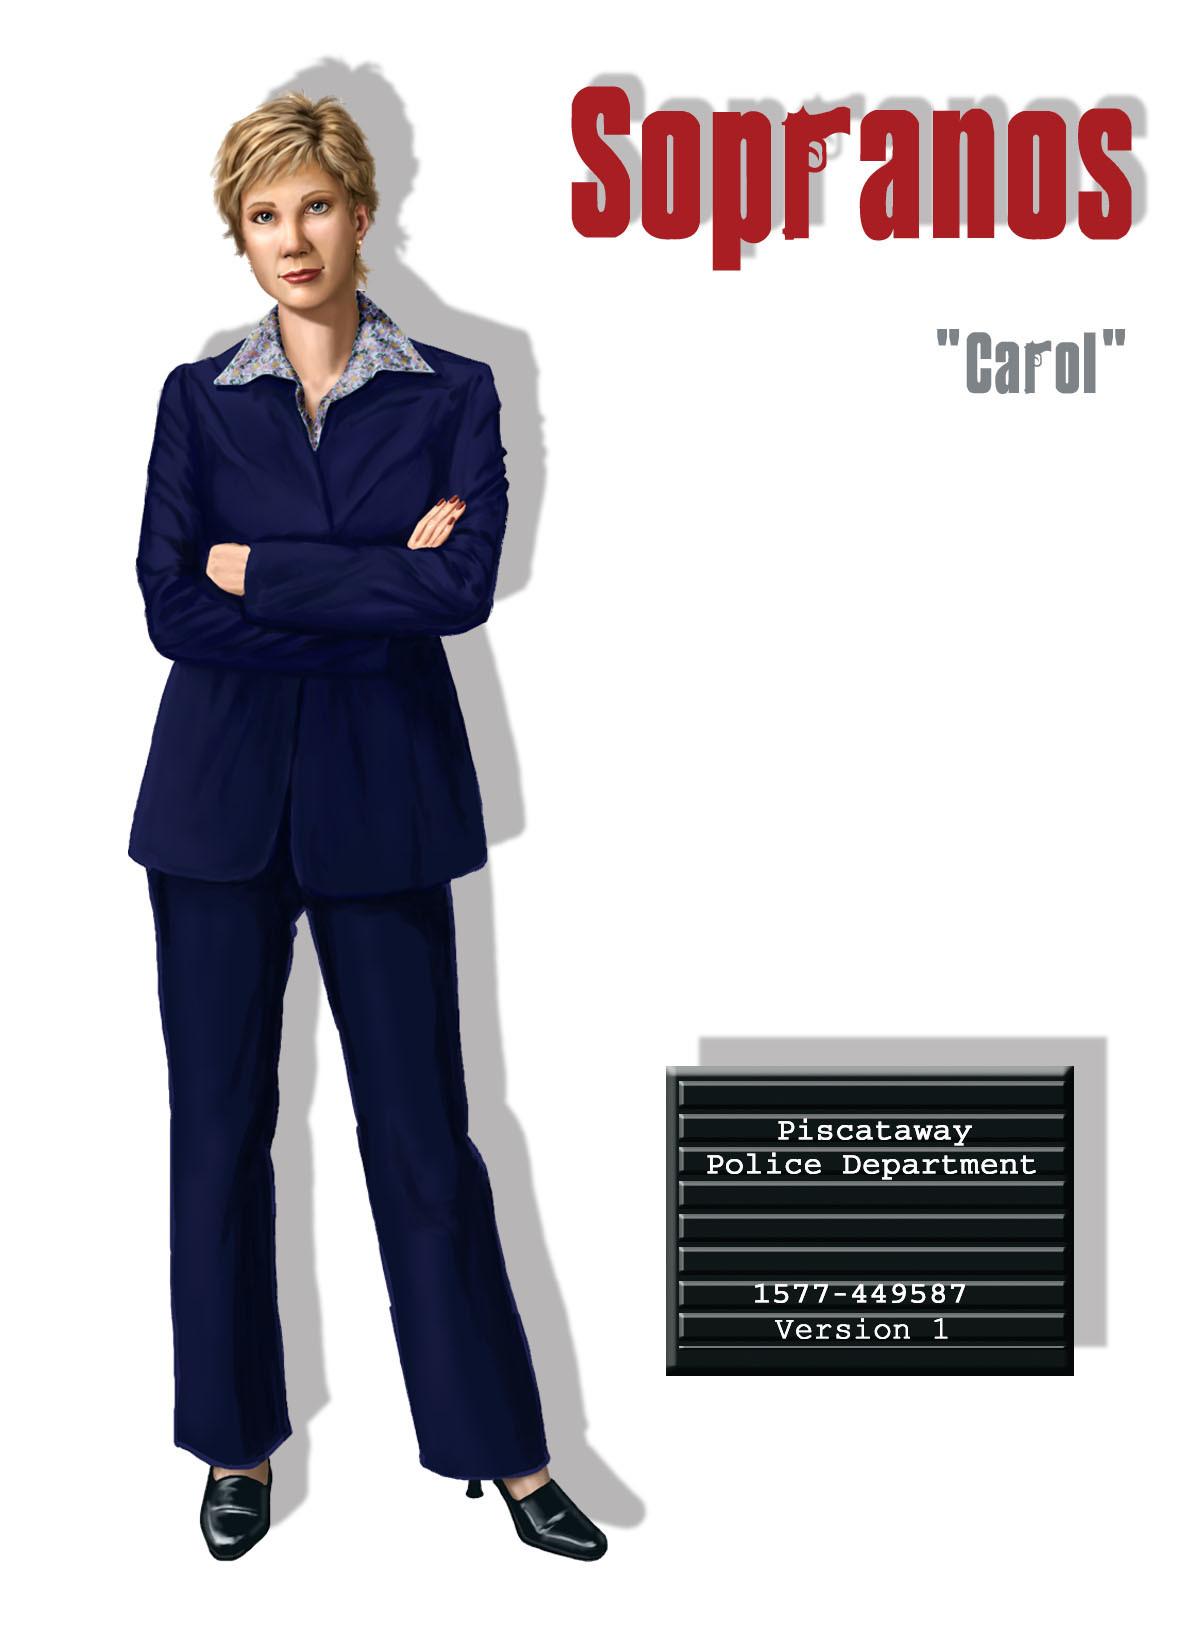 Jeff zugale sop npc carol concept v1